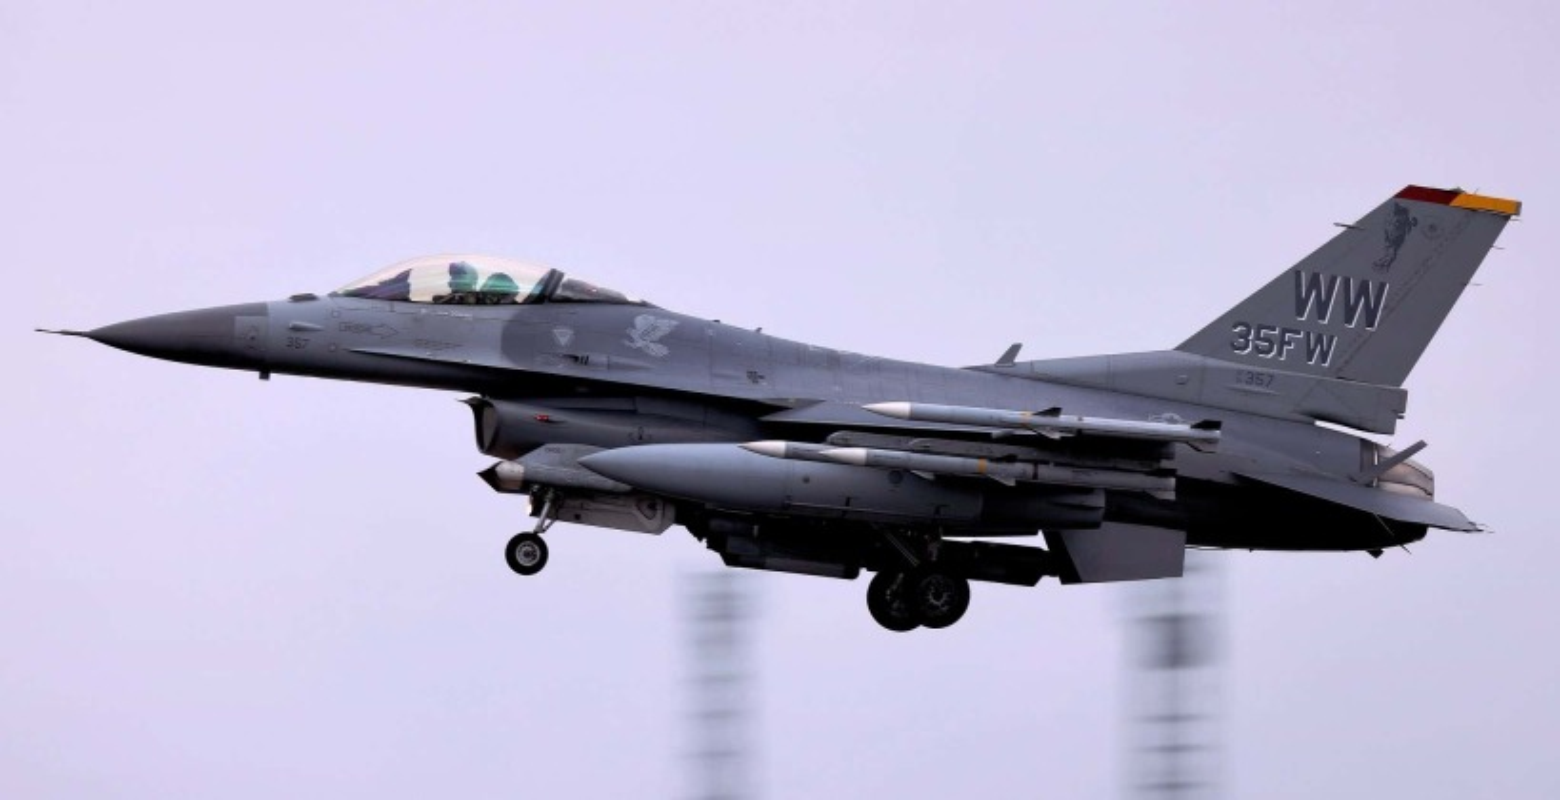 Suc manh dan tiem kich F-16 My dang dat ngay sat nach Trung Quoc